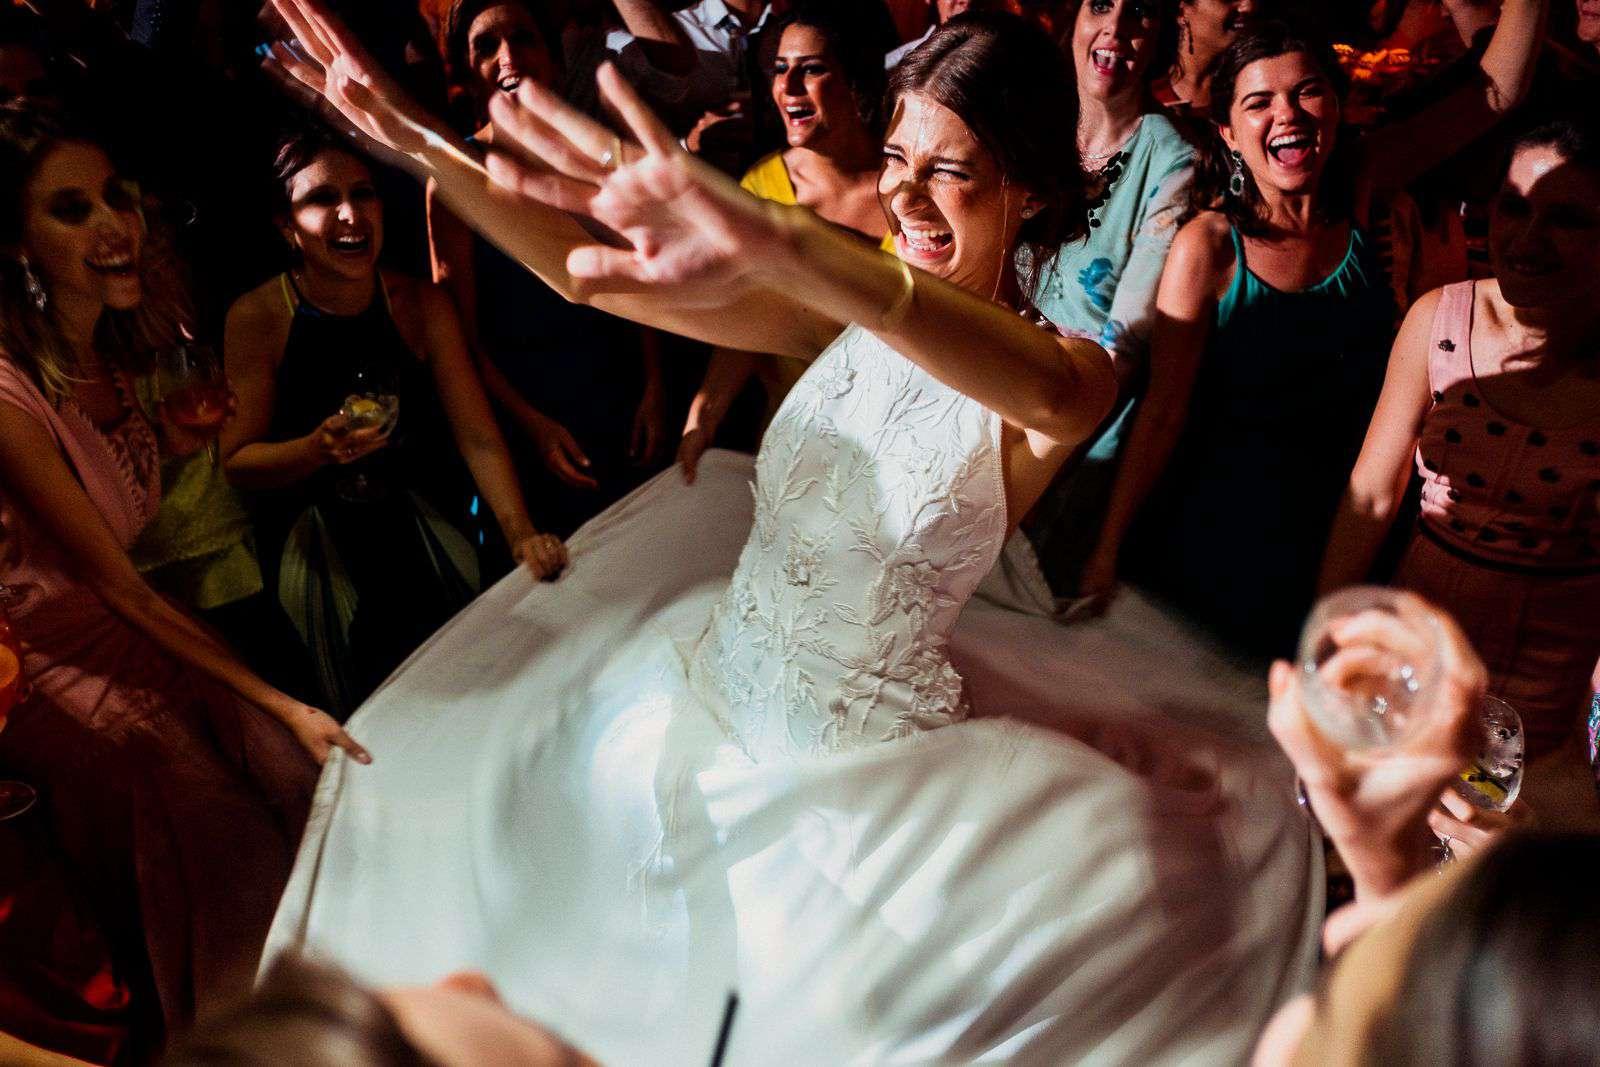 Brazilian bride dancing with friends